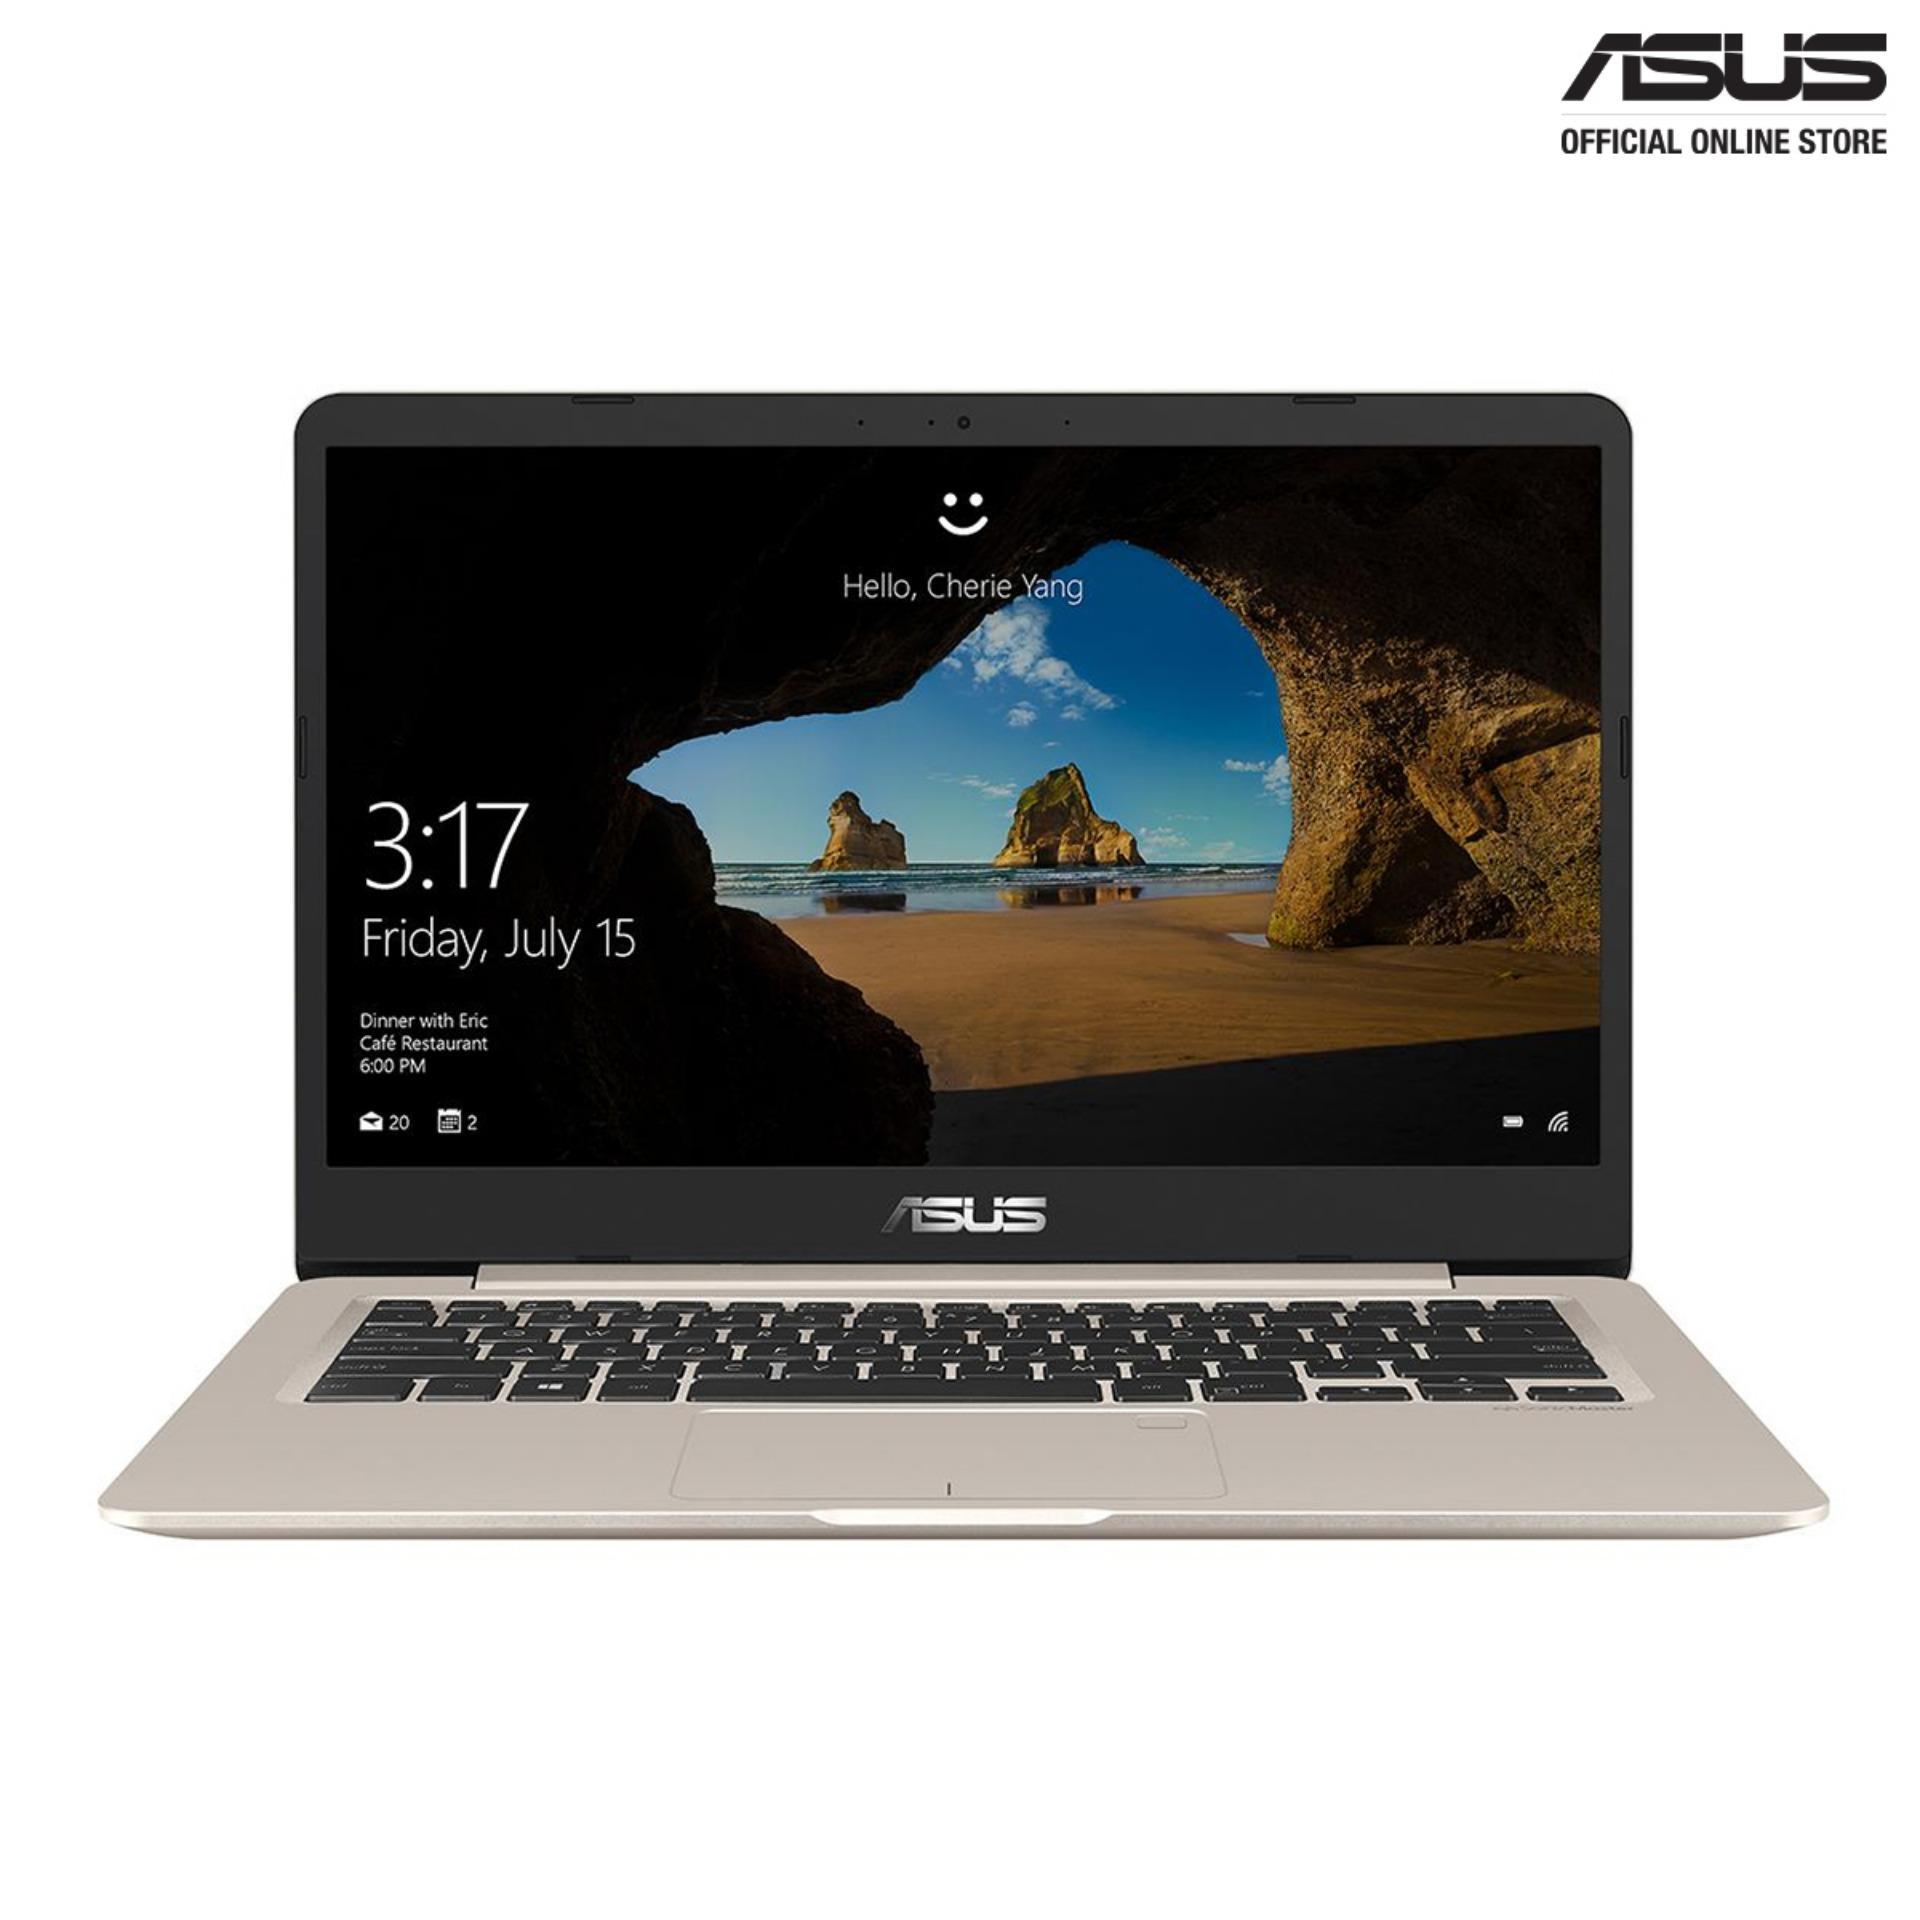 ASUS VivoBook S406UA-BM145T